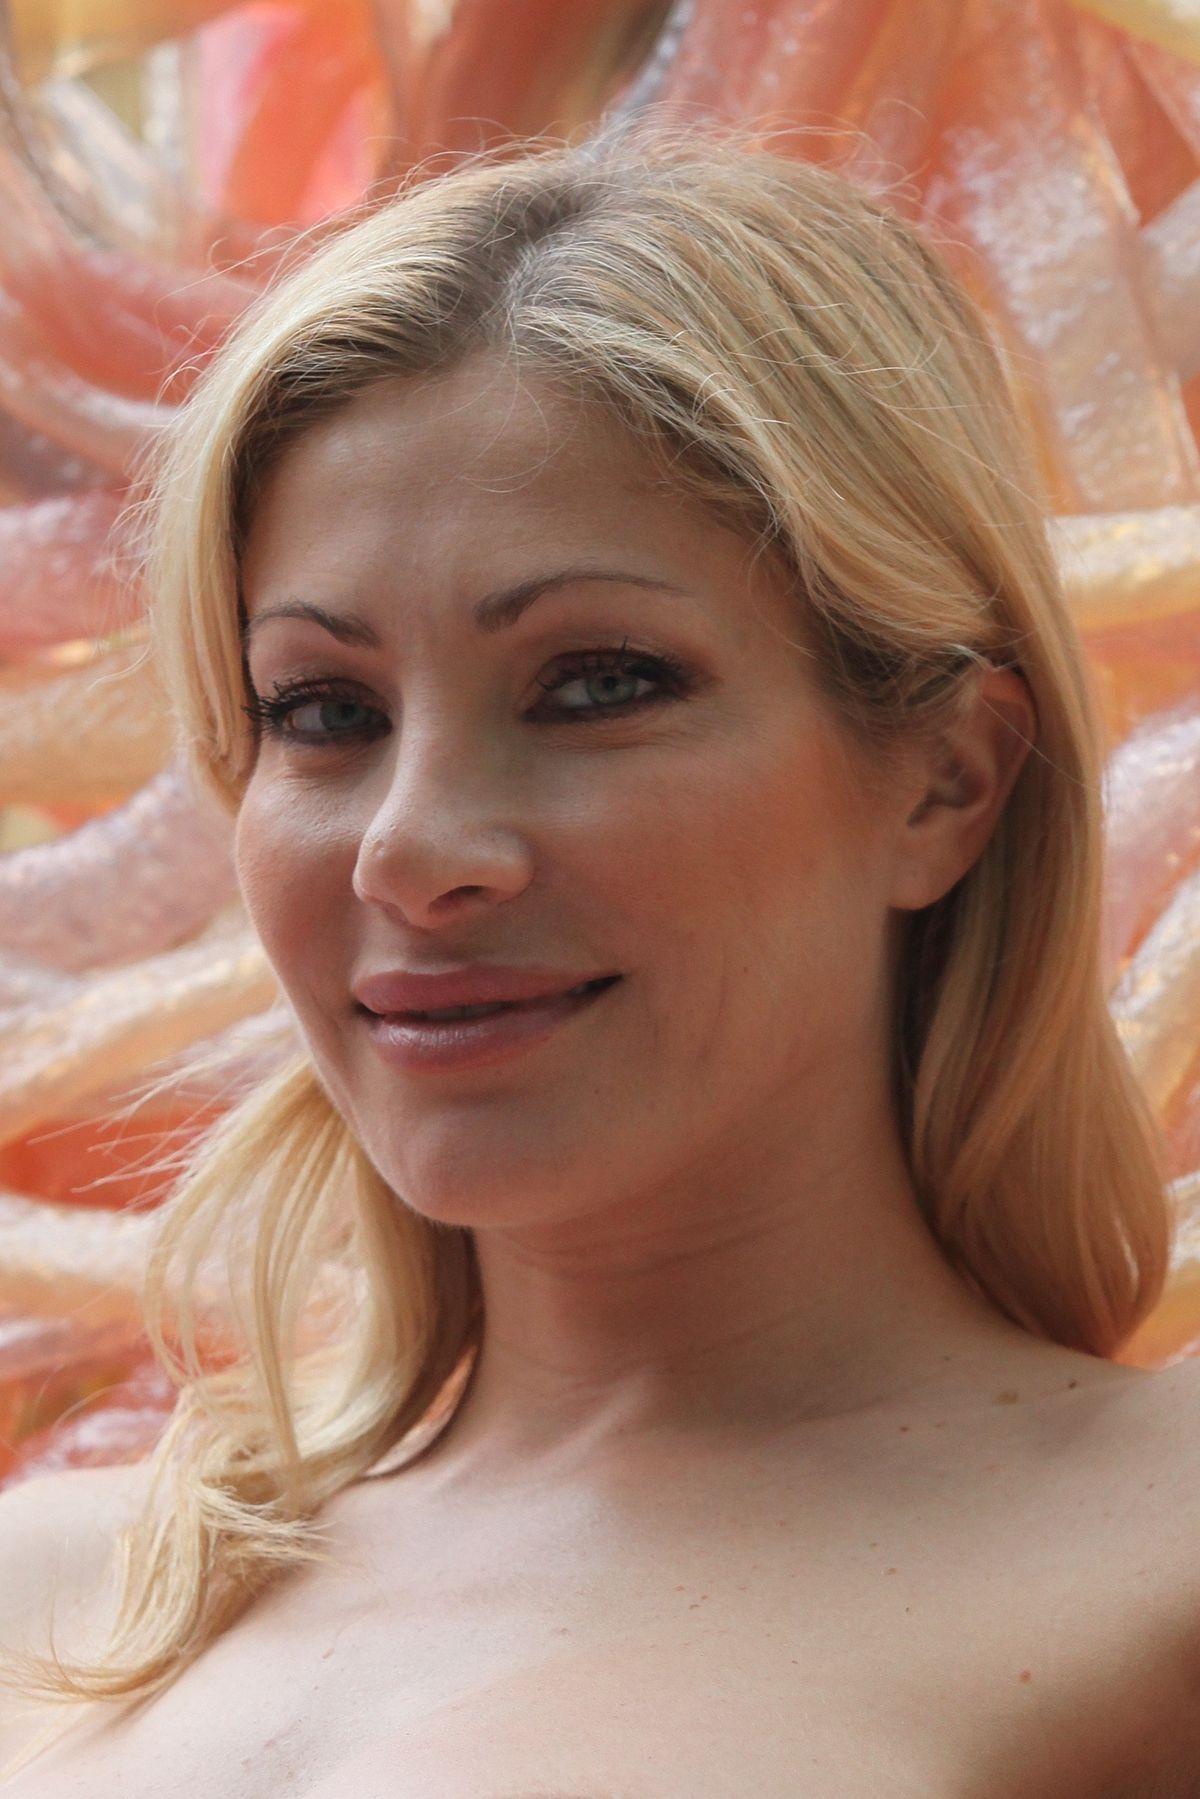 filmati erotici italiani programmi hard in tv